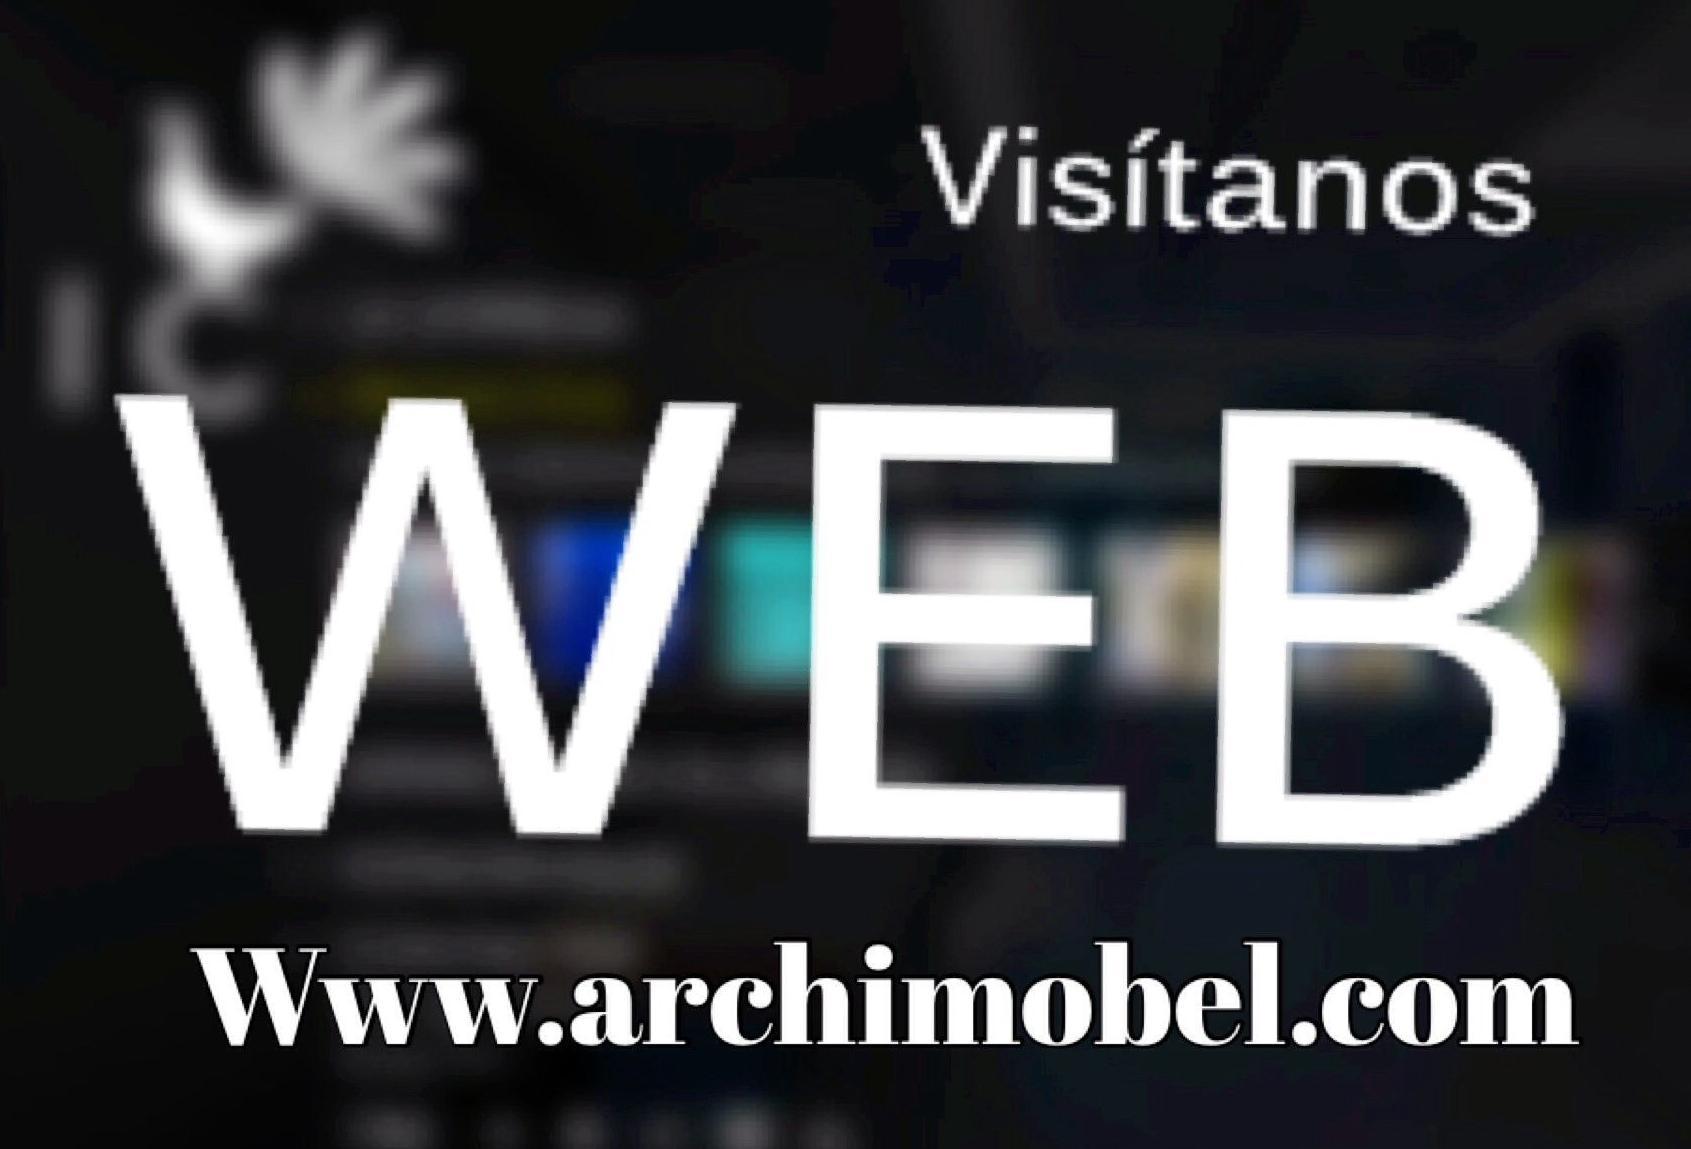 Web archimobel.com